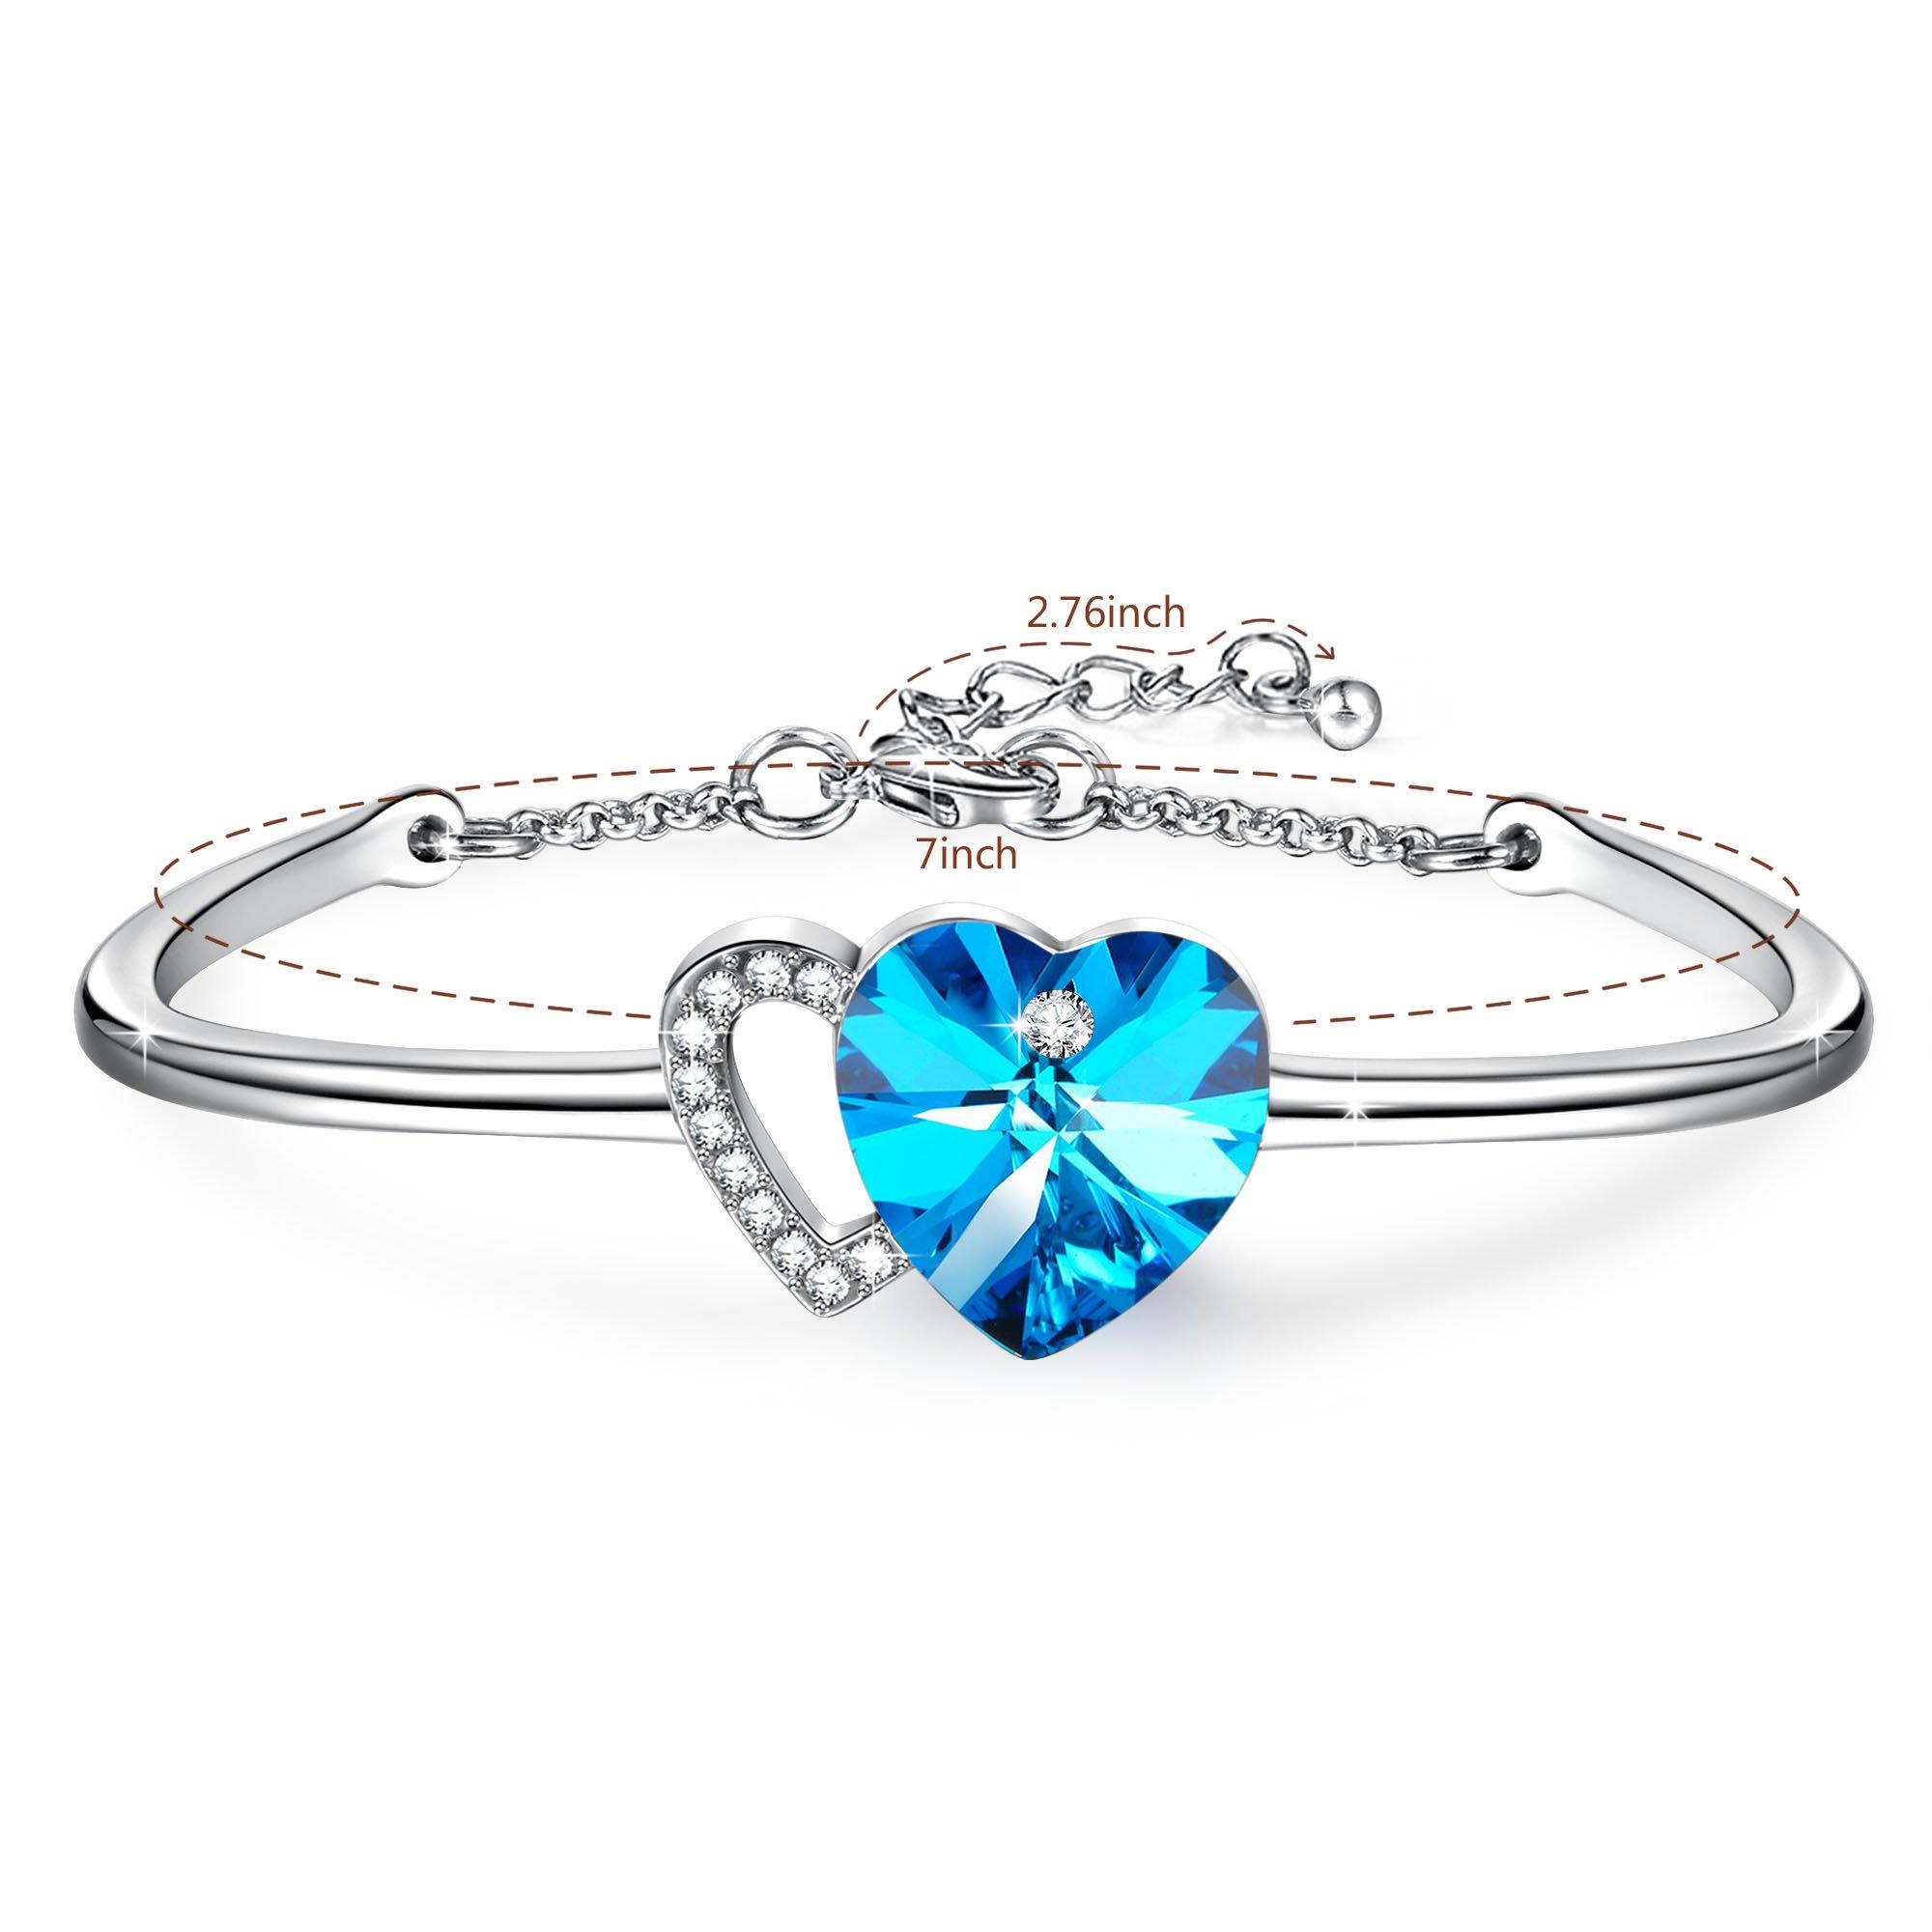 Angelady Love Story Heart Link Bangle Bracelet for Birthday Anniversary Wedding Gifts,Blue Crystal from Swarovski